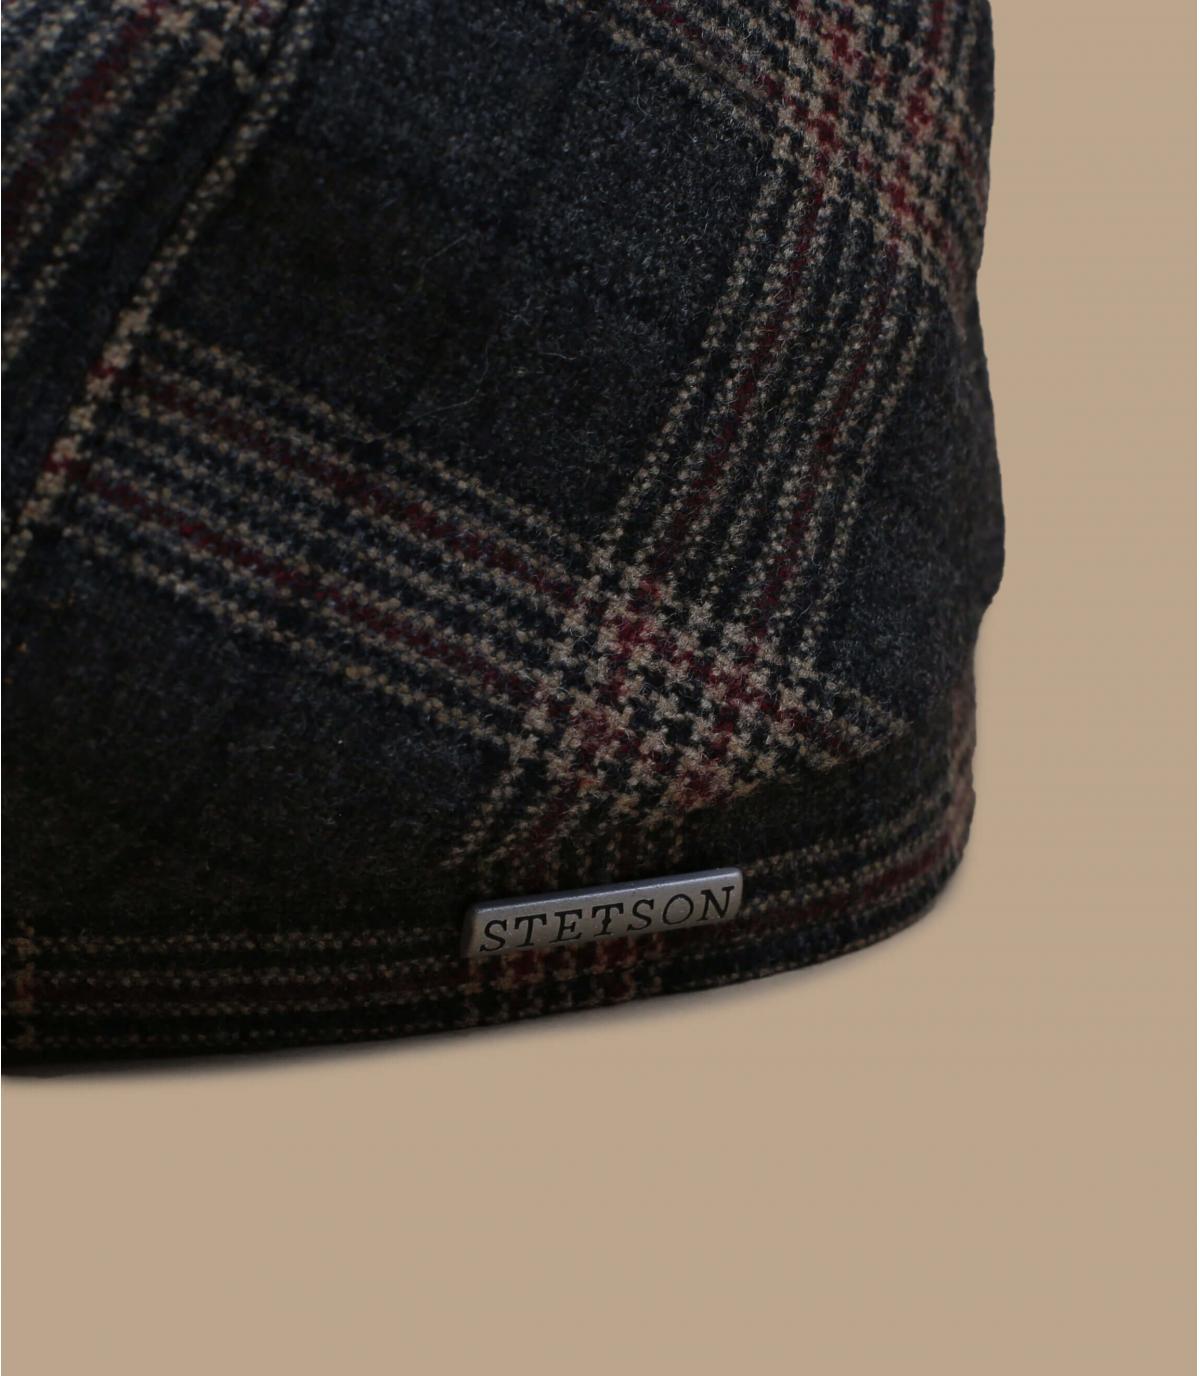 Details 6-Panel Cap Wool Check grey brown - Abbildung 2